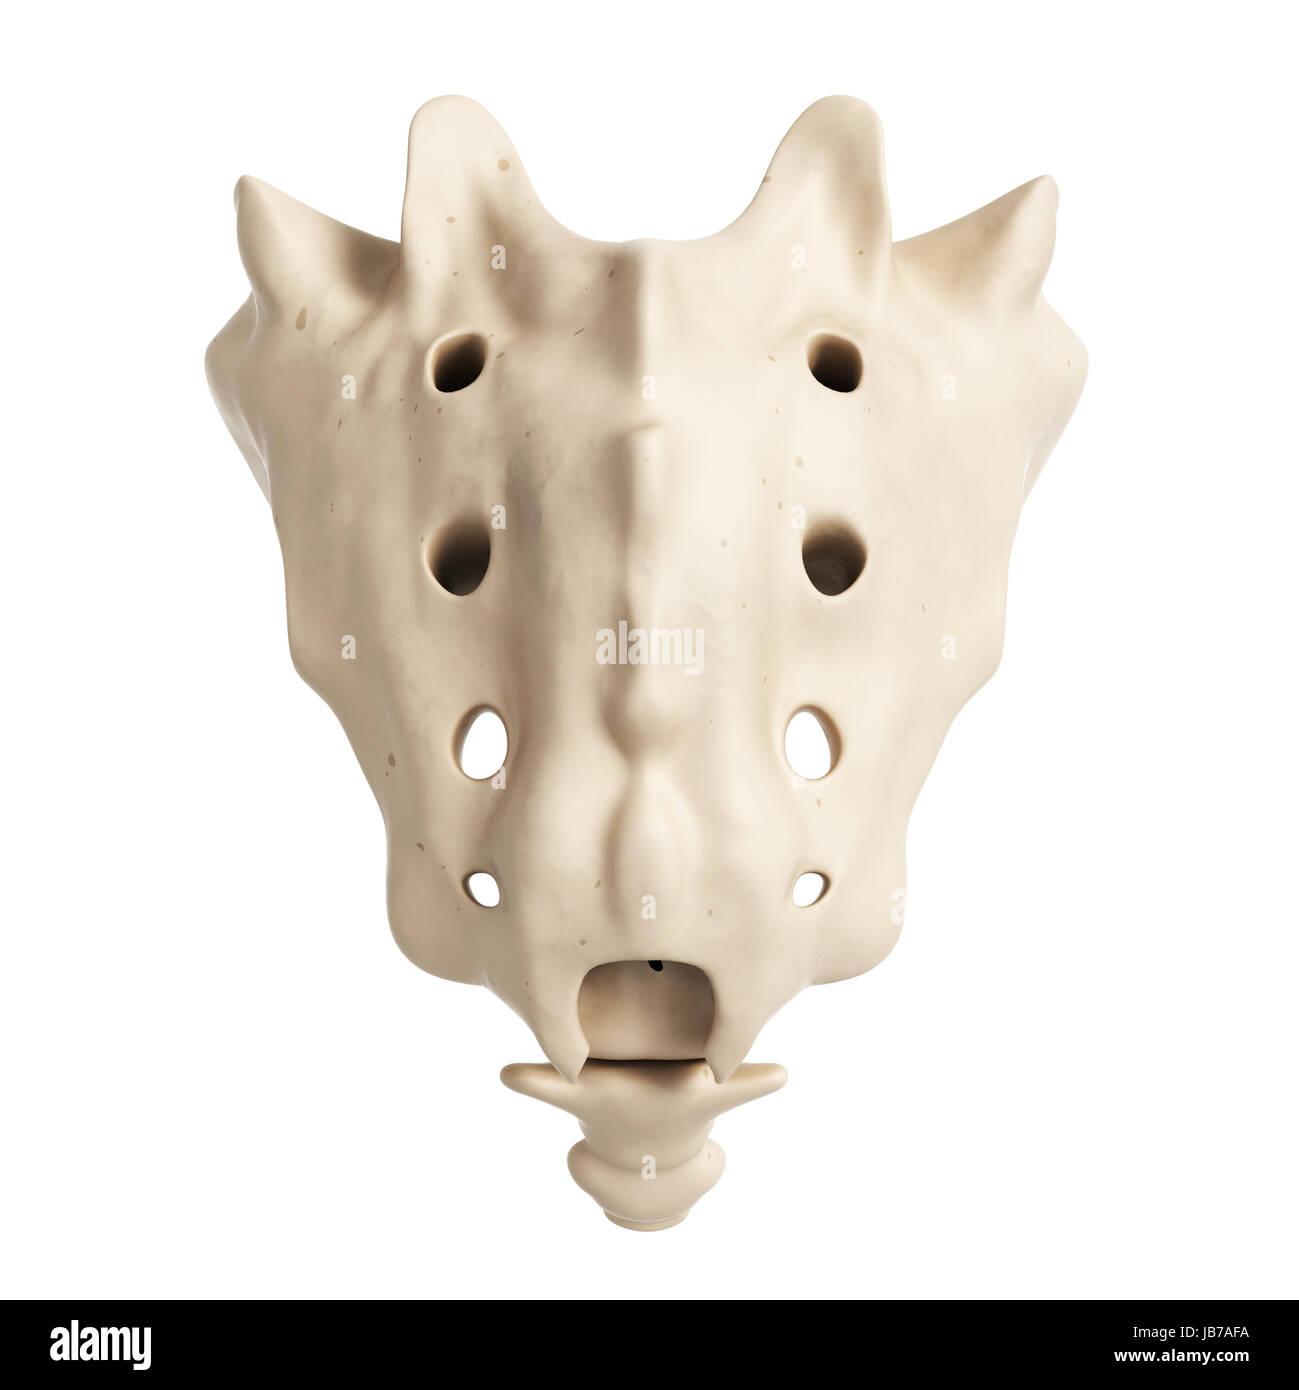 Sacrum Bone Stockfotos & Sacrum Bone Bilder - Alamy